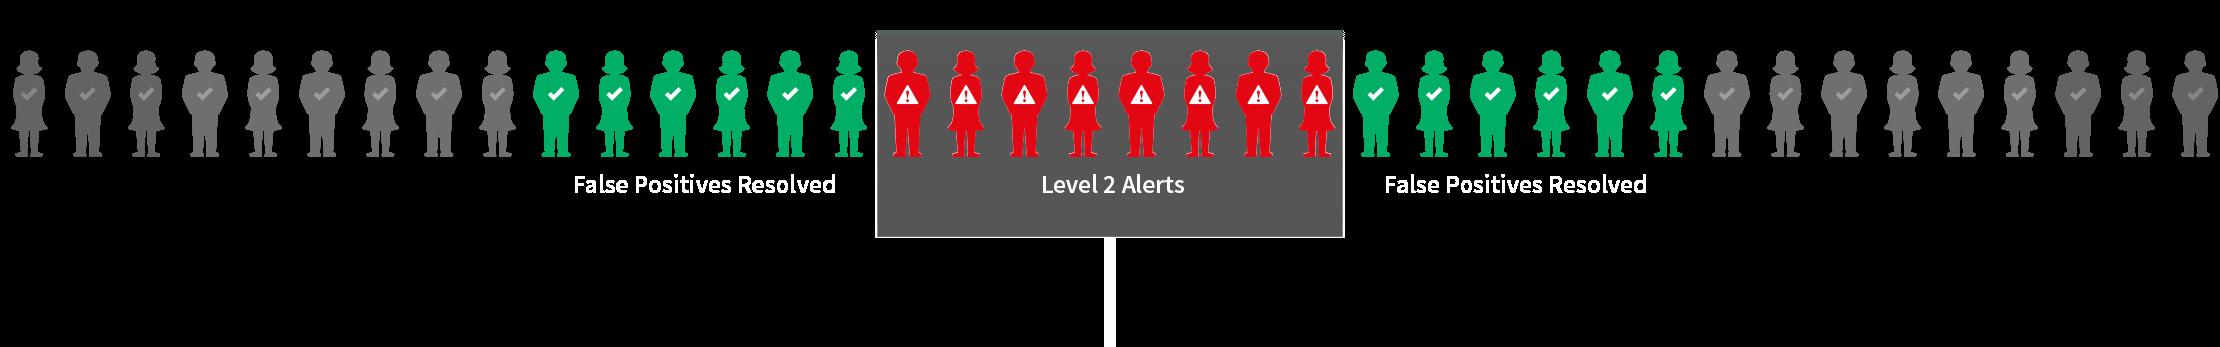 Level 2 Alerts